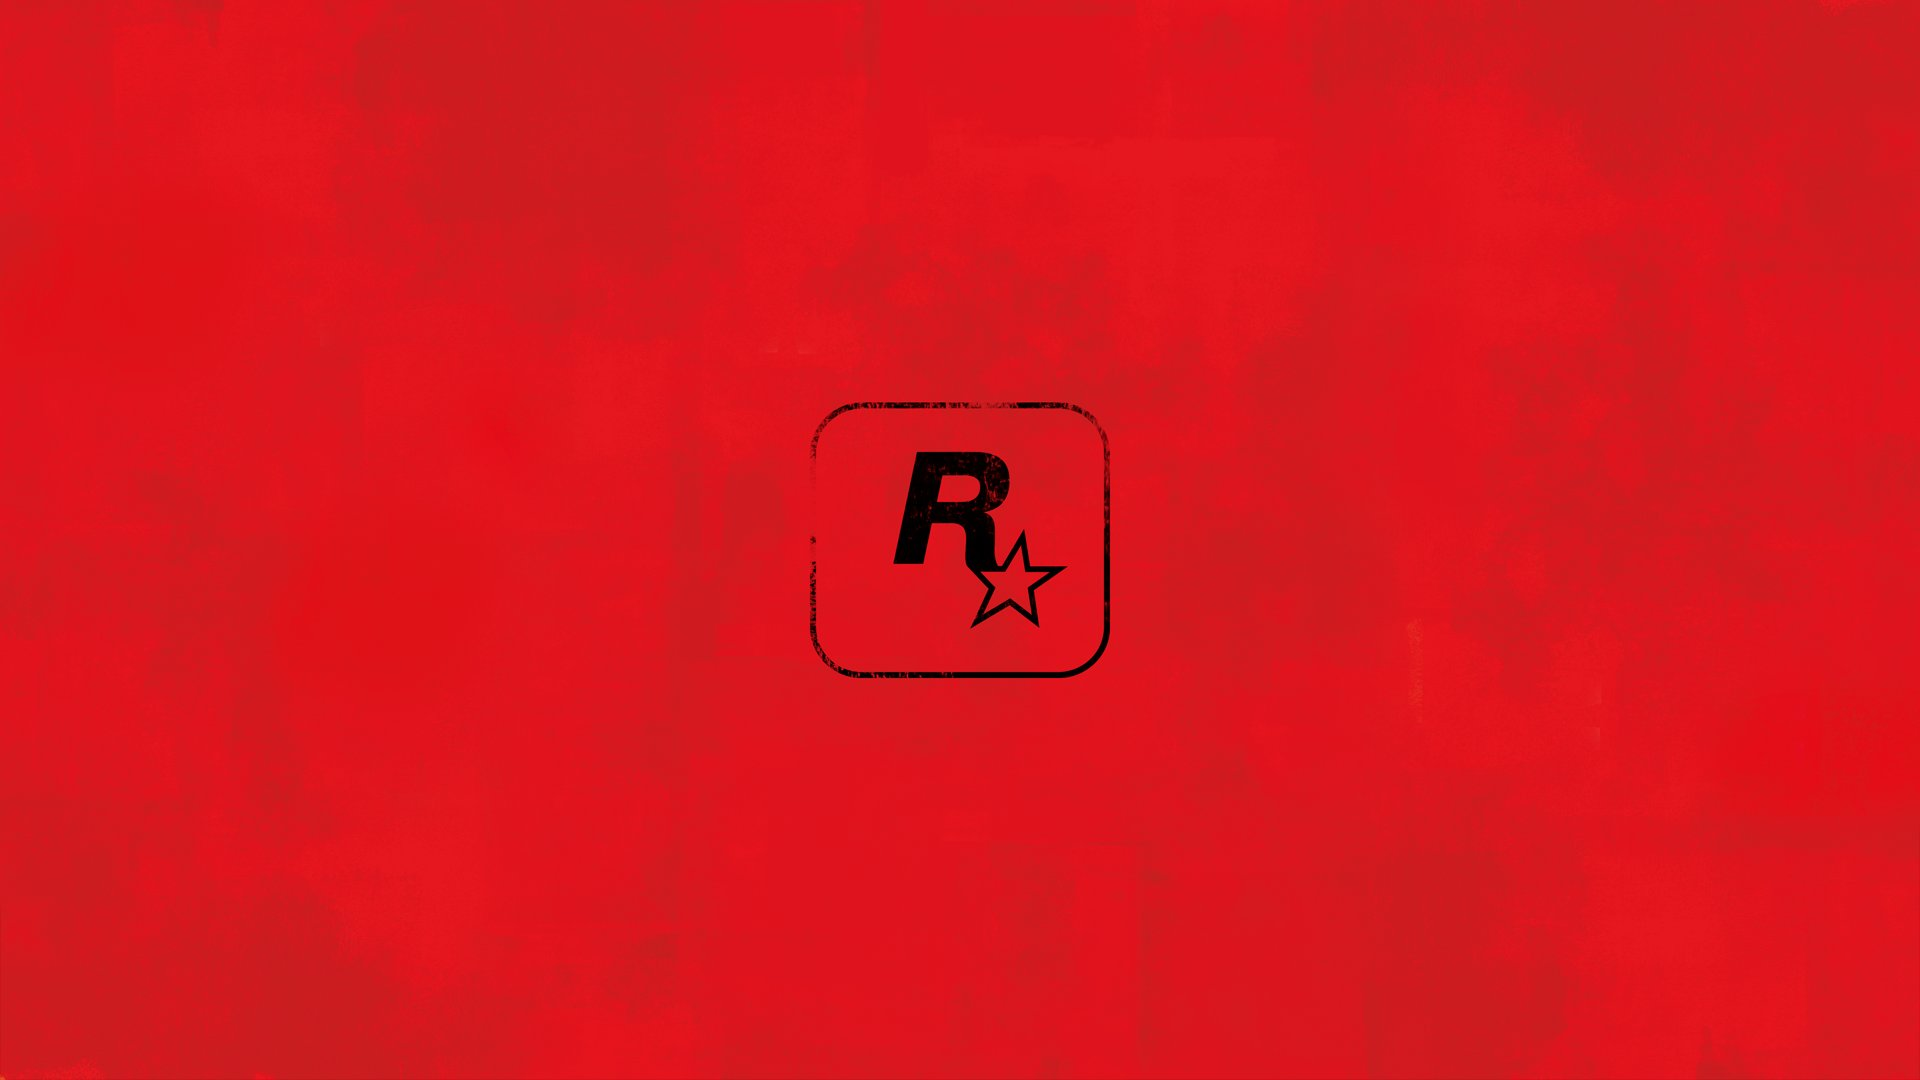 rockstar games, red dead redemption, red dead redemption 2, tease